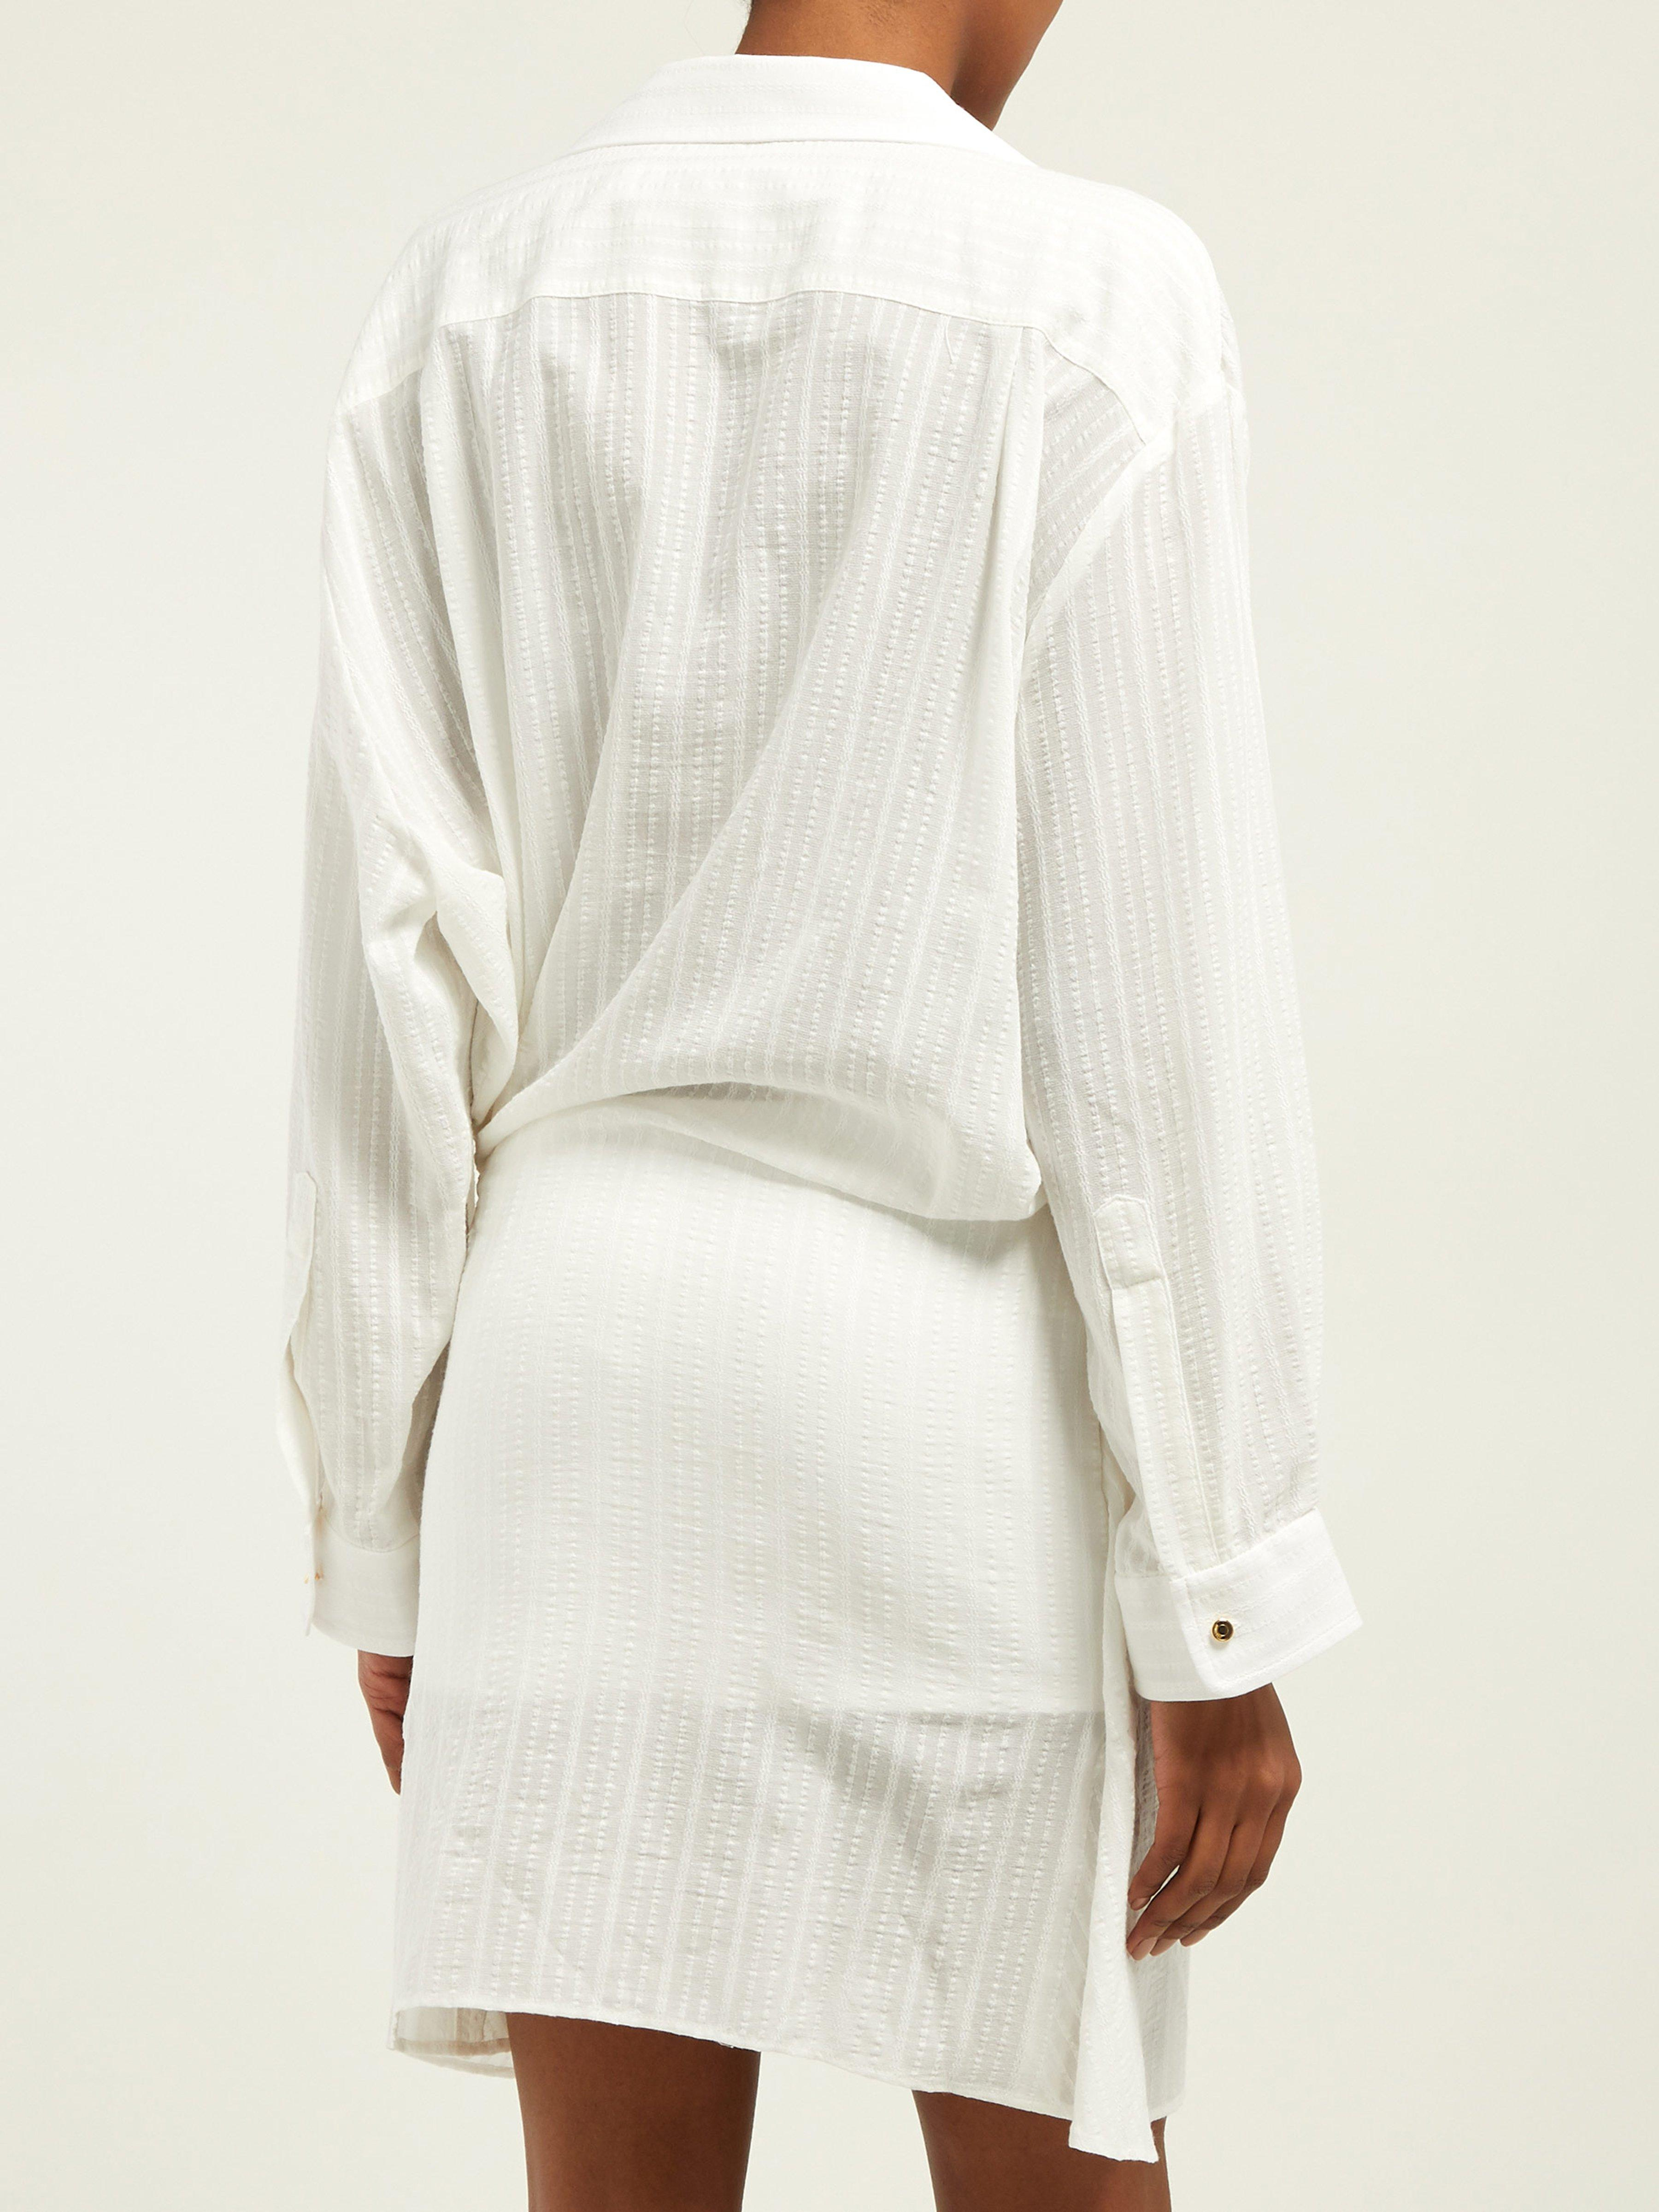 175f764a9c Jacquemus - White Alassio Knot Front Cotton Blend Dress - Lyst. View  fullscreen